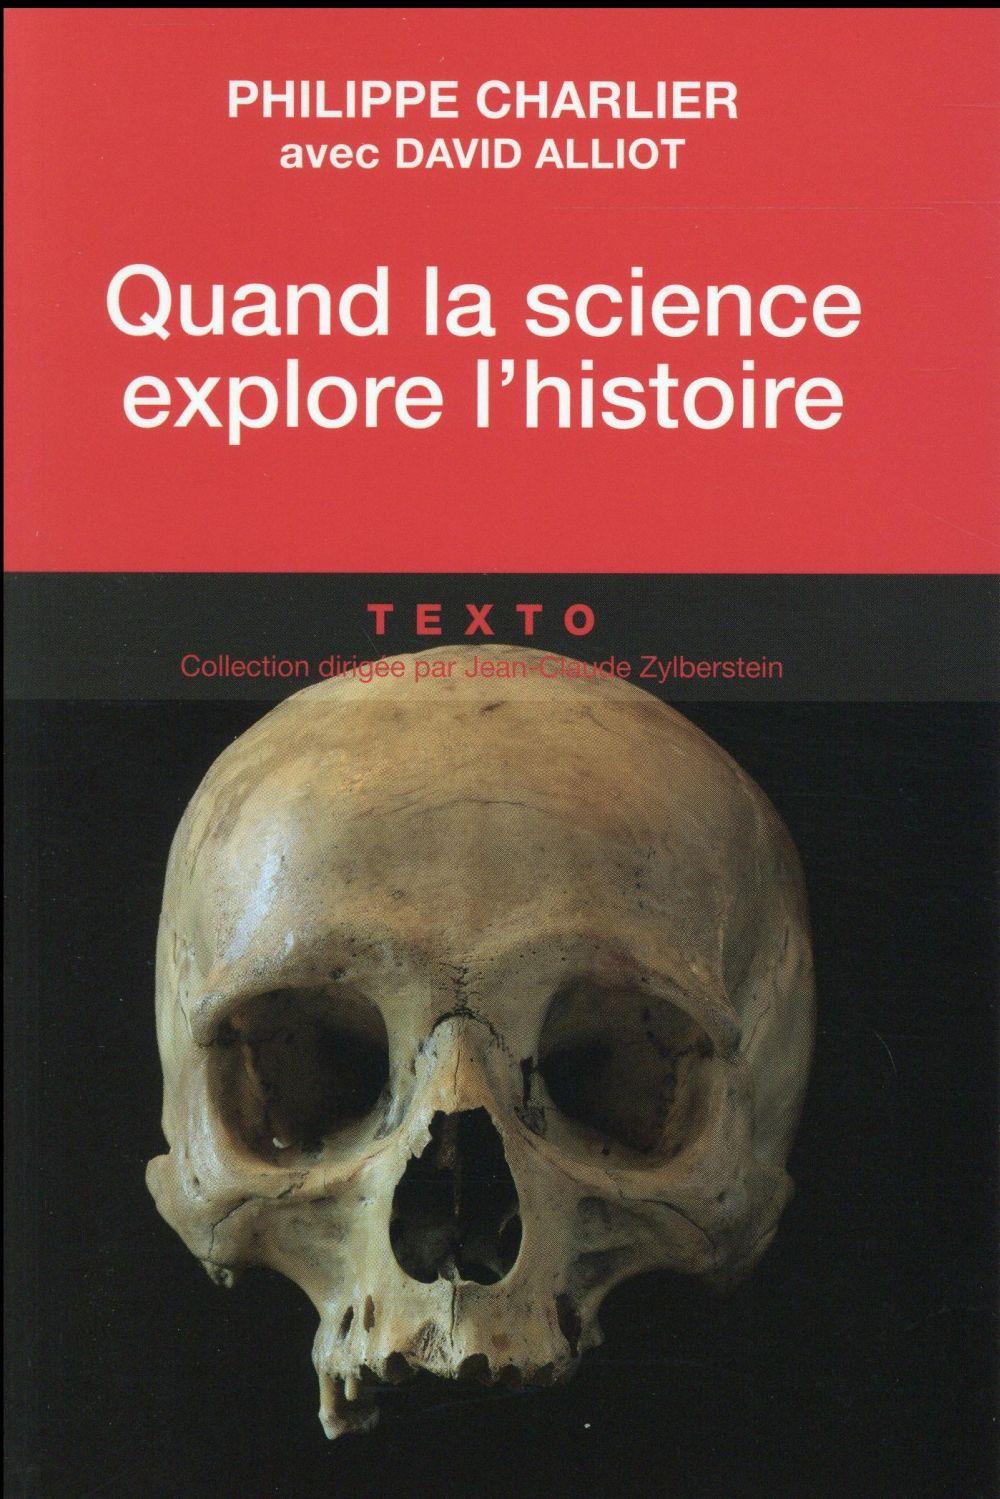 Charlier Philippe - QUAND LA SCIENCE EXPLORE L'HISTOIRE MEDECINE LEGALE ET ANTHROPOLOGIE